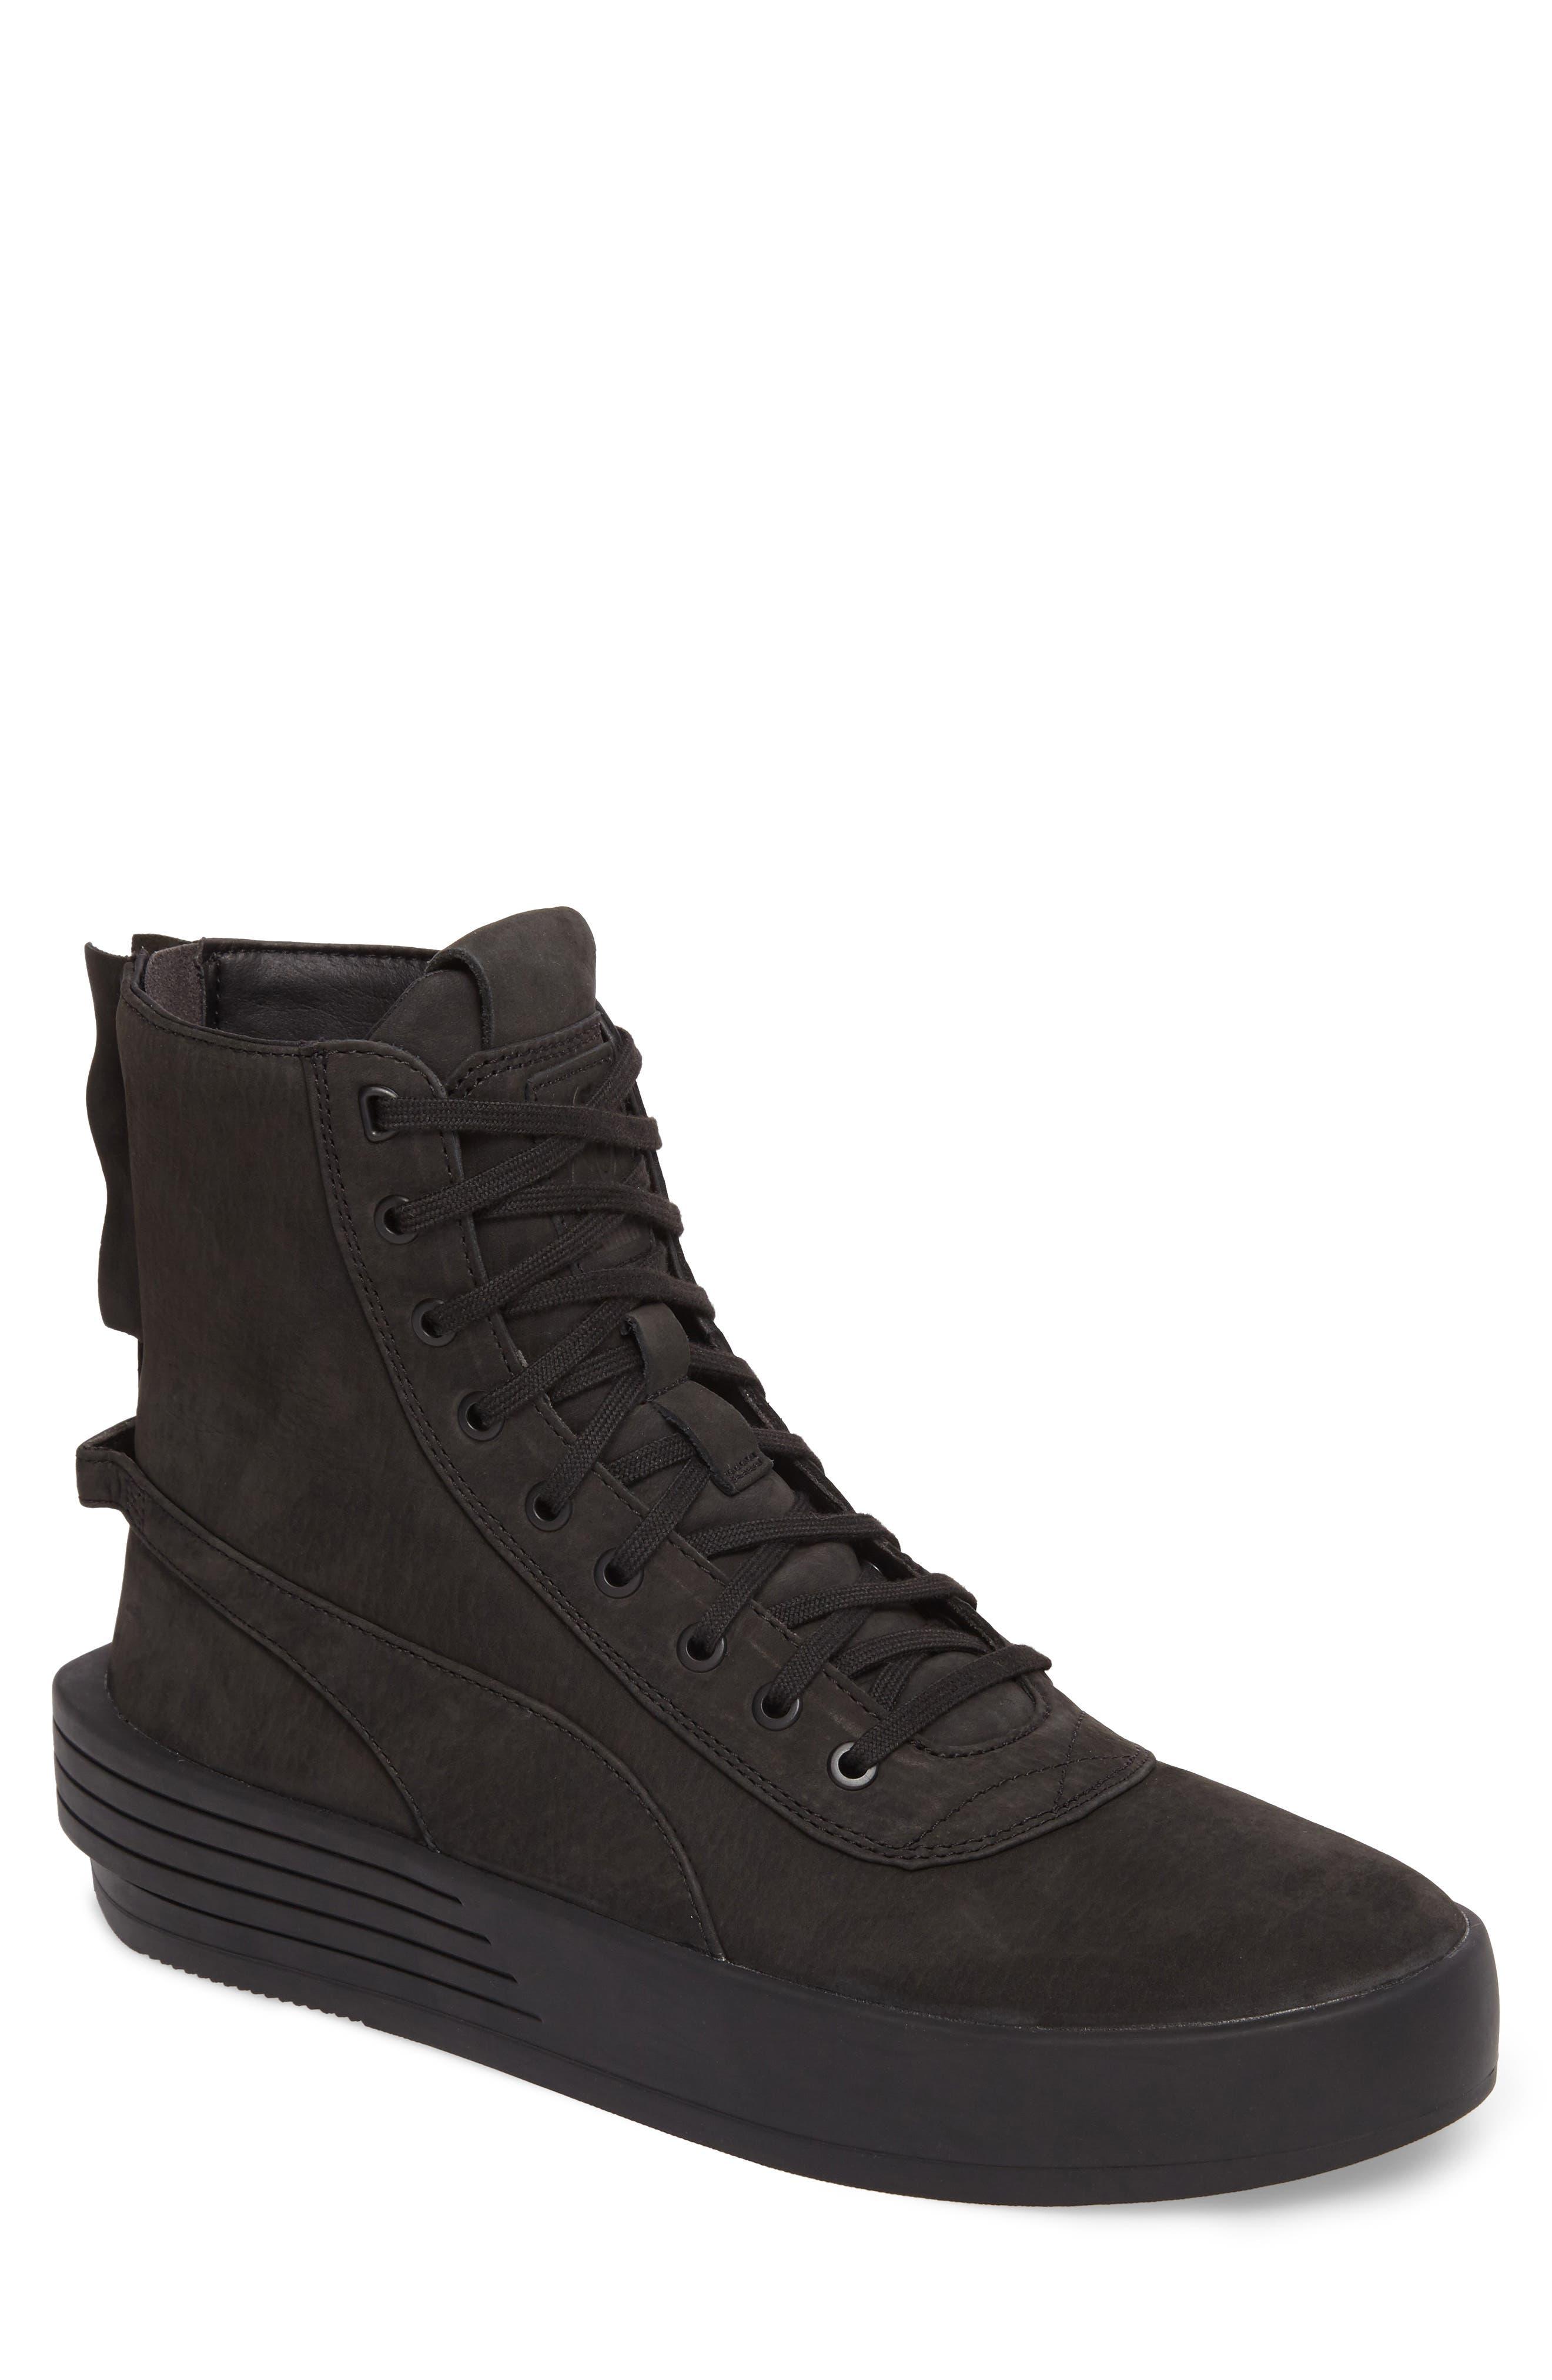 XO Parallel Weeknd Sneaker,                             Main thumbnail 1, color,                             001